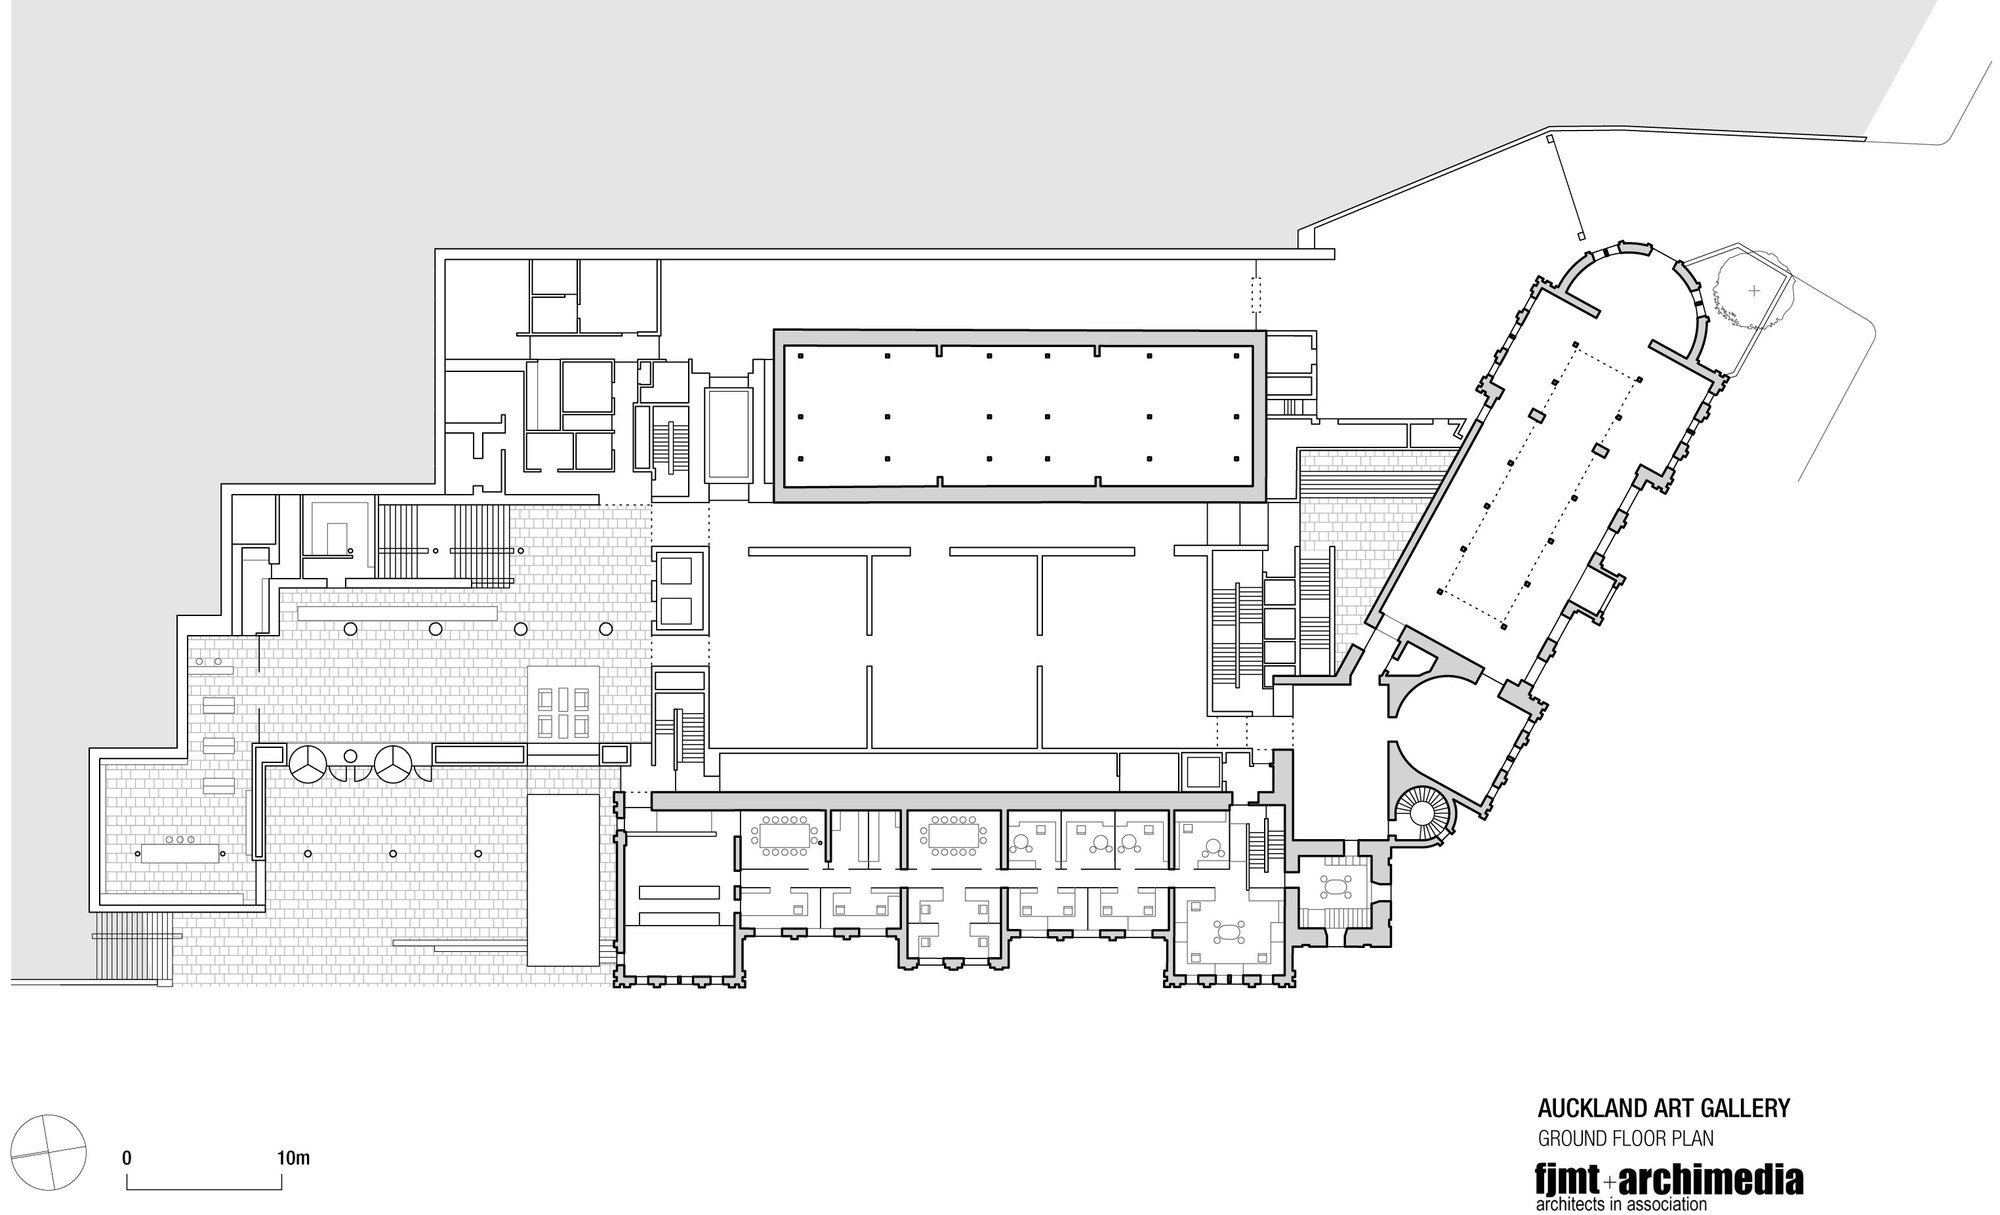 Great Ground Floor Plan